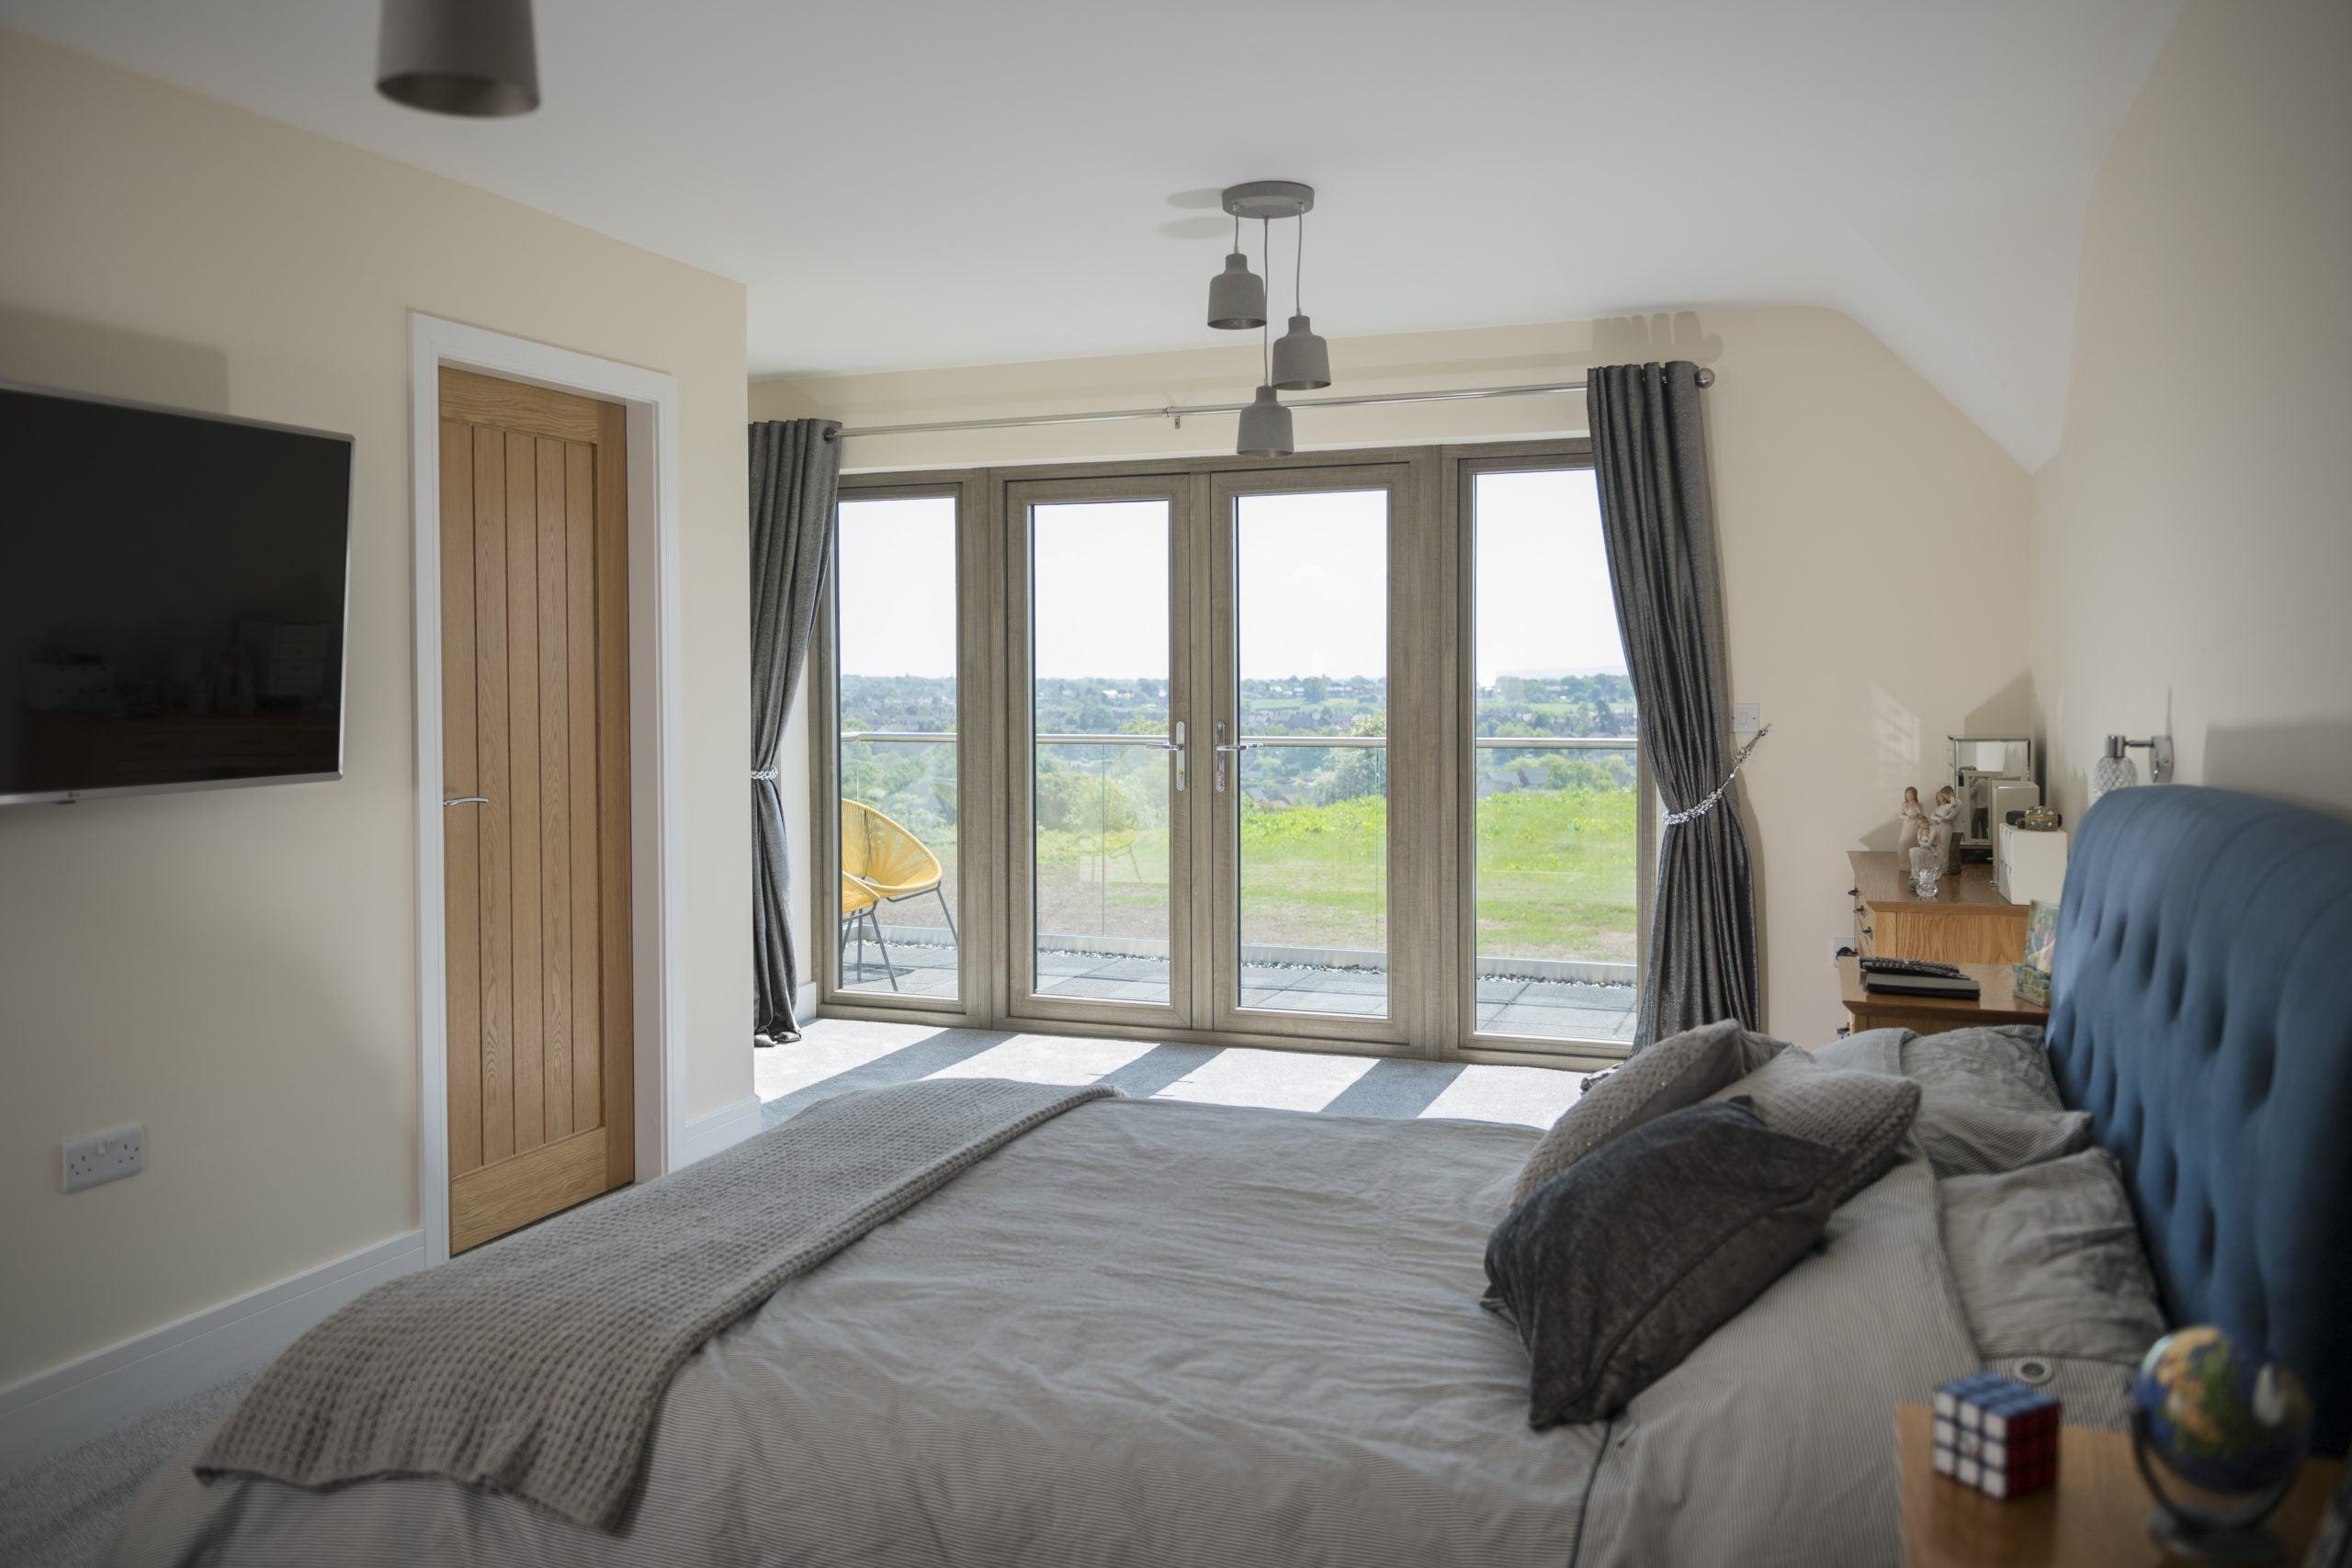 Wharfedale Window Company - Residence 2 windows in Silvered Oak